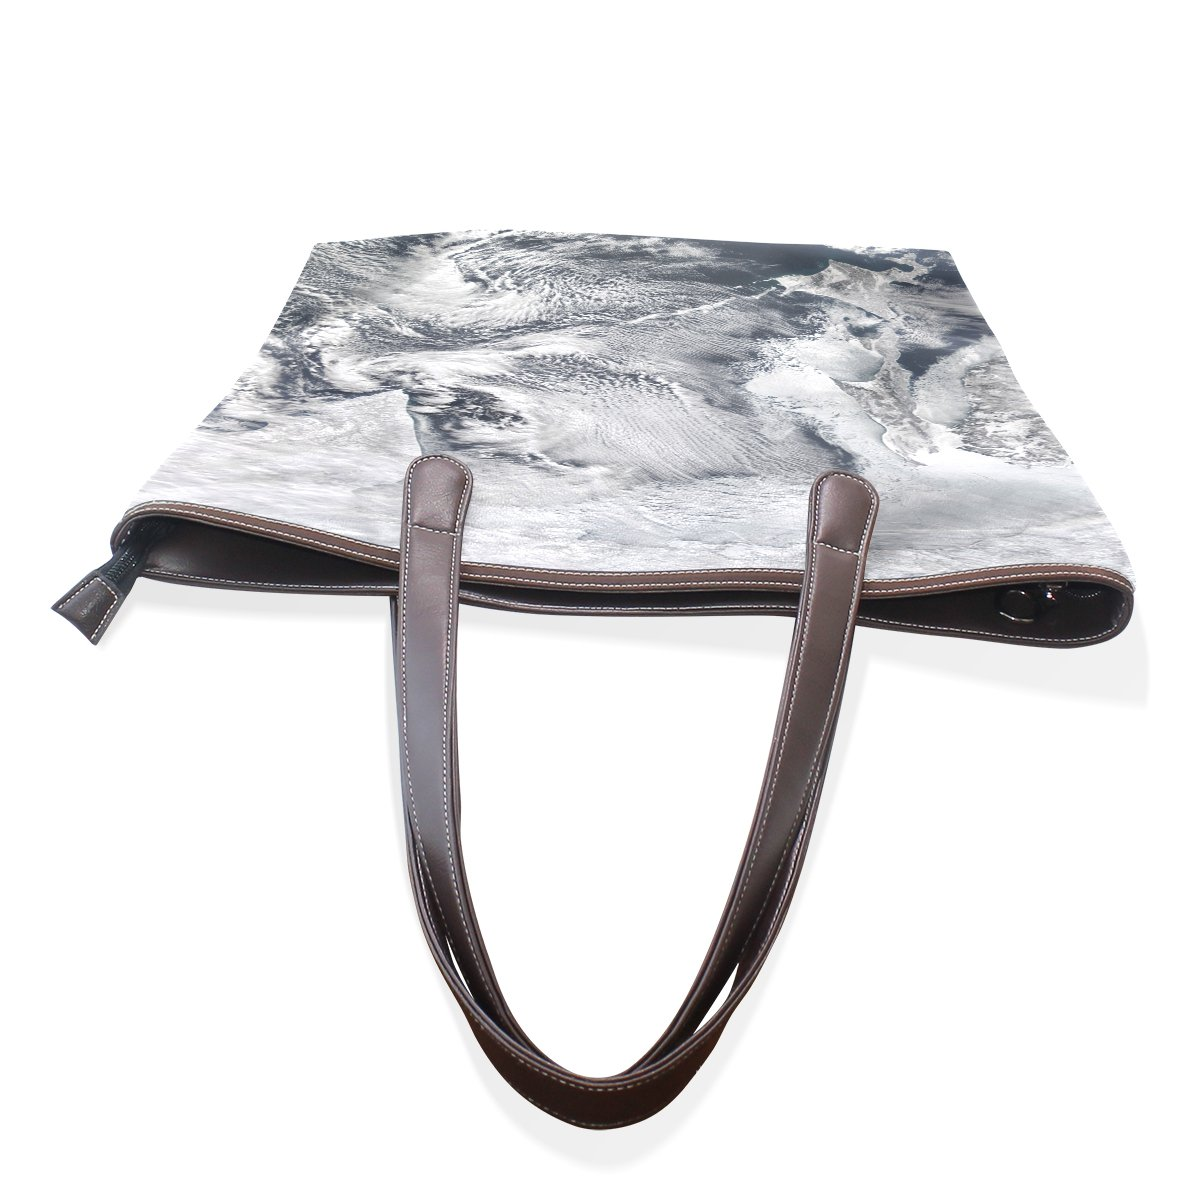 SCDS Painting The Waves PU Leather Lady Handbag Tote Bag Zipper Shoulder Bag